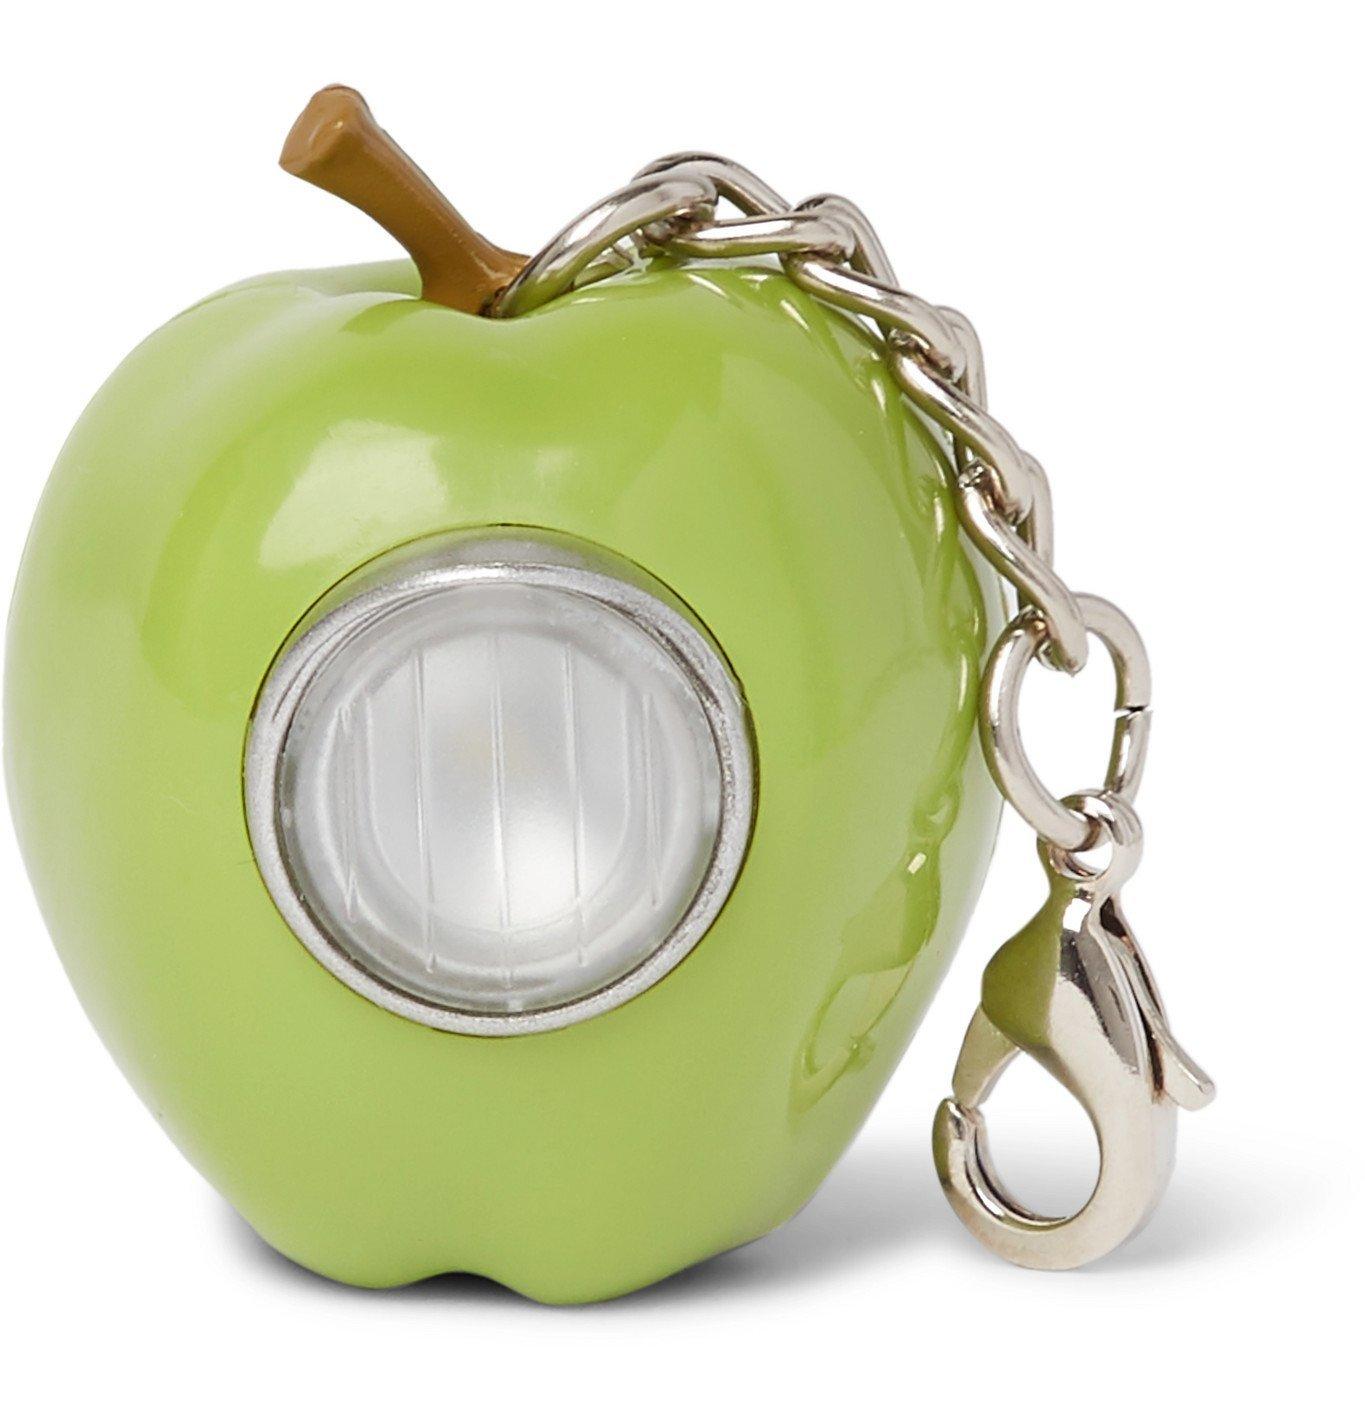 Photo: Undercover - Medicom Gilapple Light Key Fob - Green